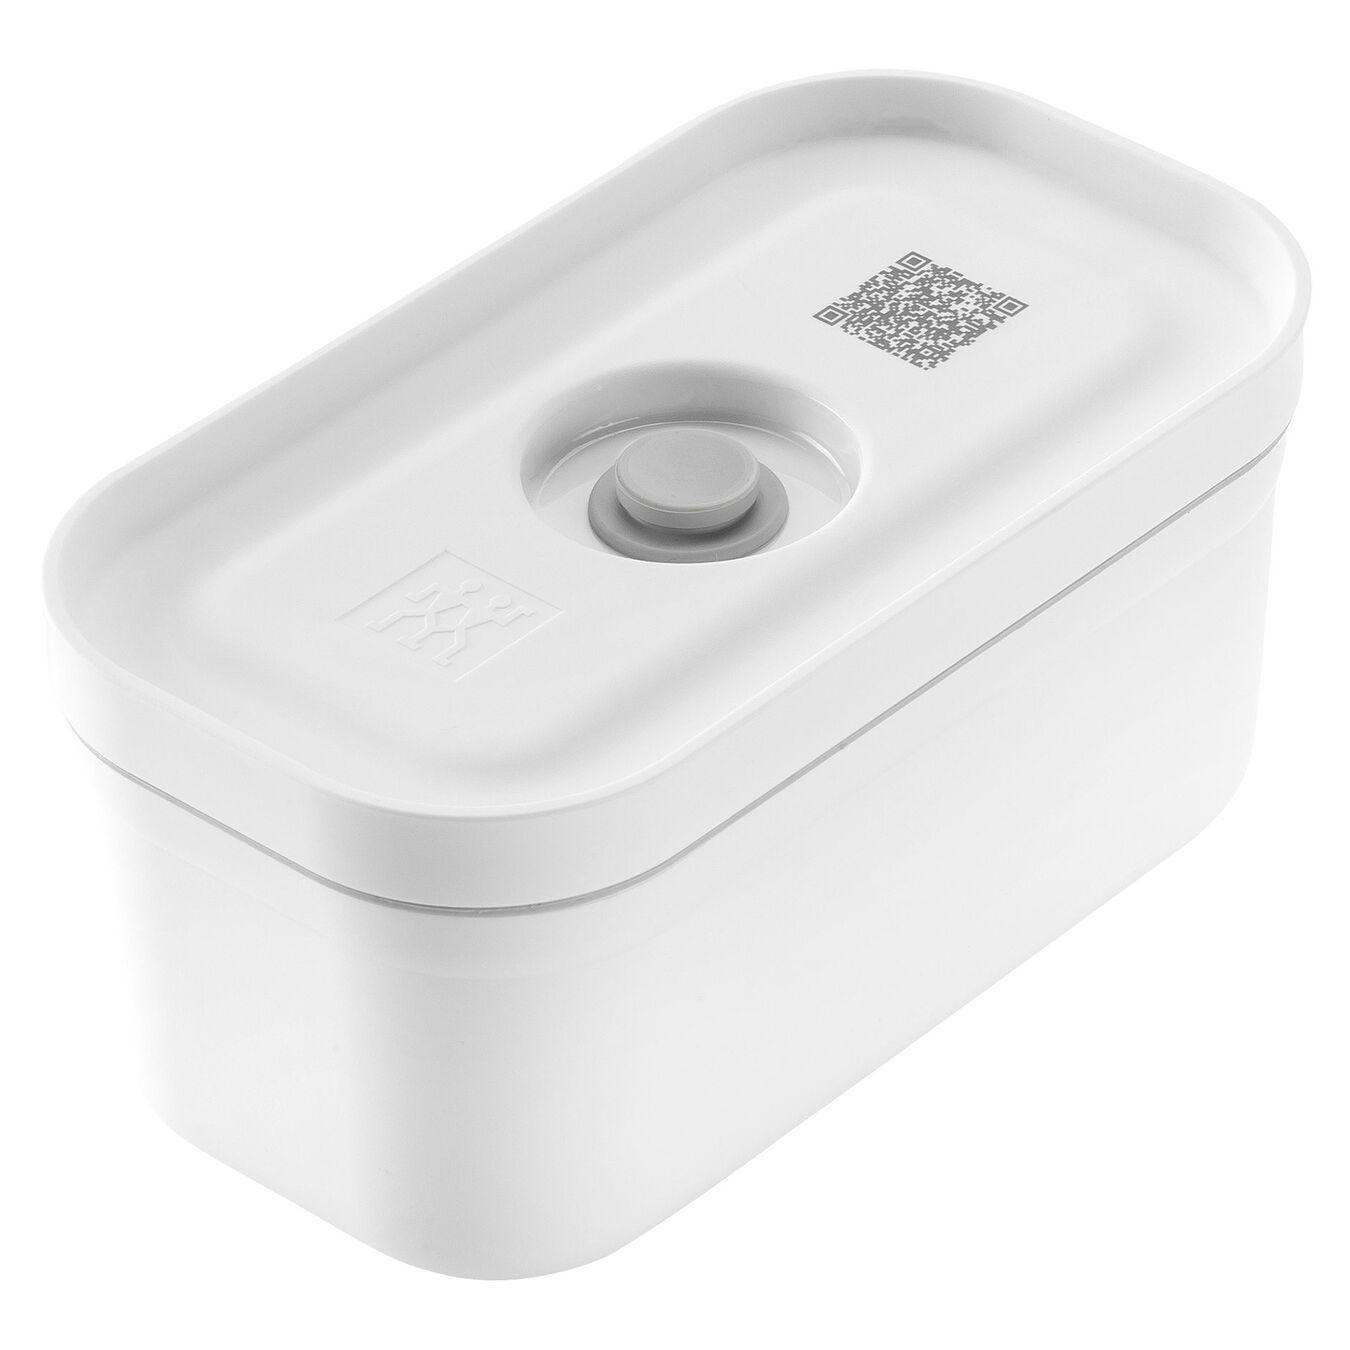 Vakuum Lunchbox, S, Kunststoff, Weiß,,large 1